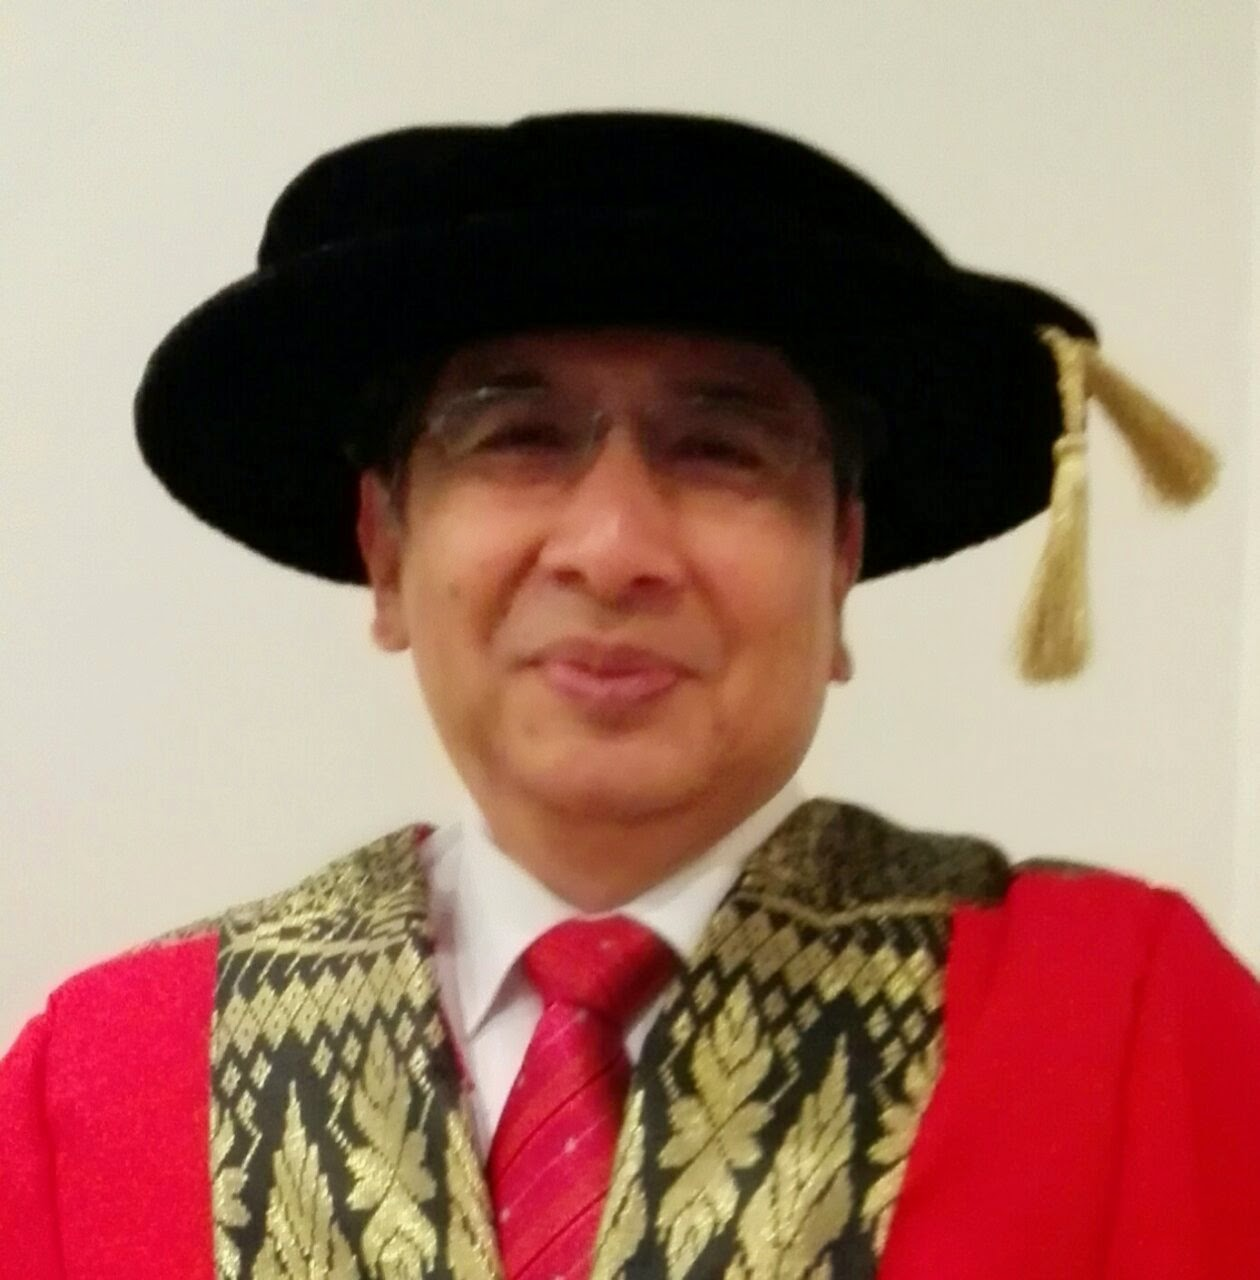 Datuk Professor (Dr) Haji Naim Mohamad